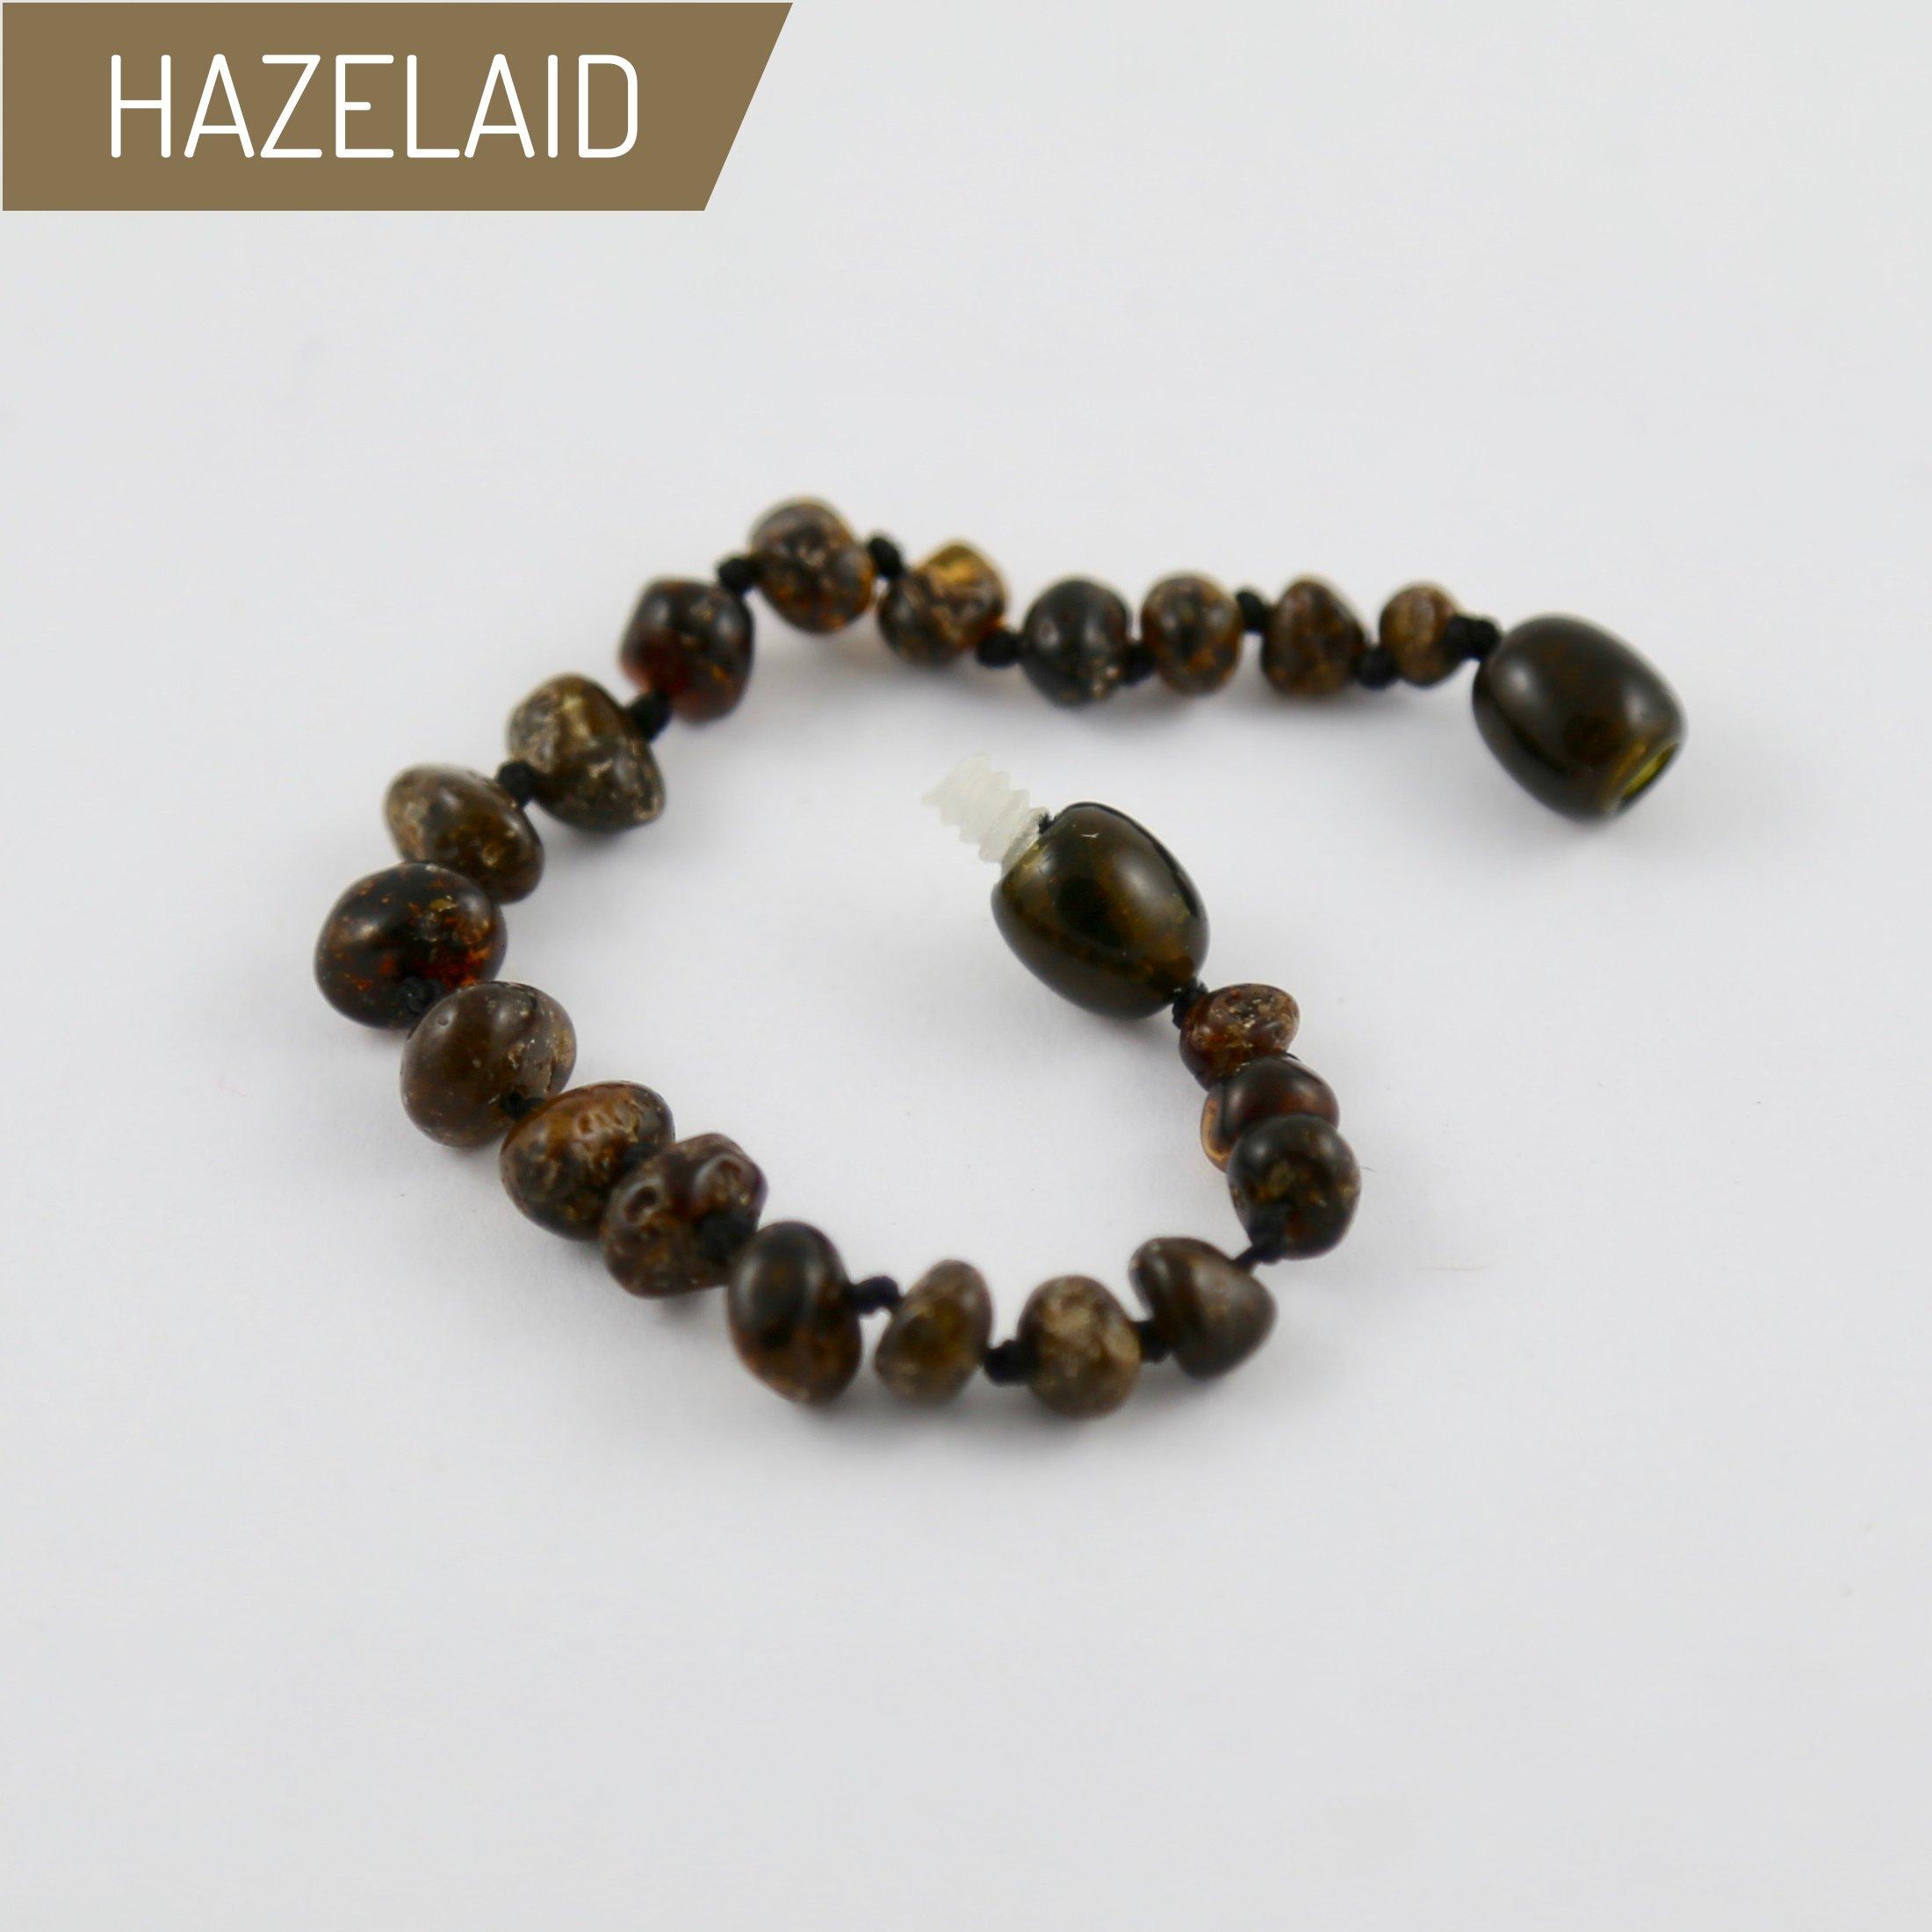 Hazelaid (TM) 5.5'' Baltic Amber Dark Green Bracelet